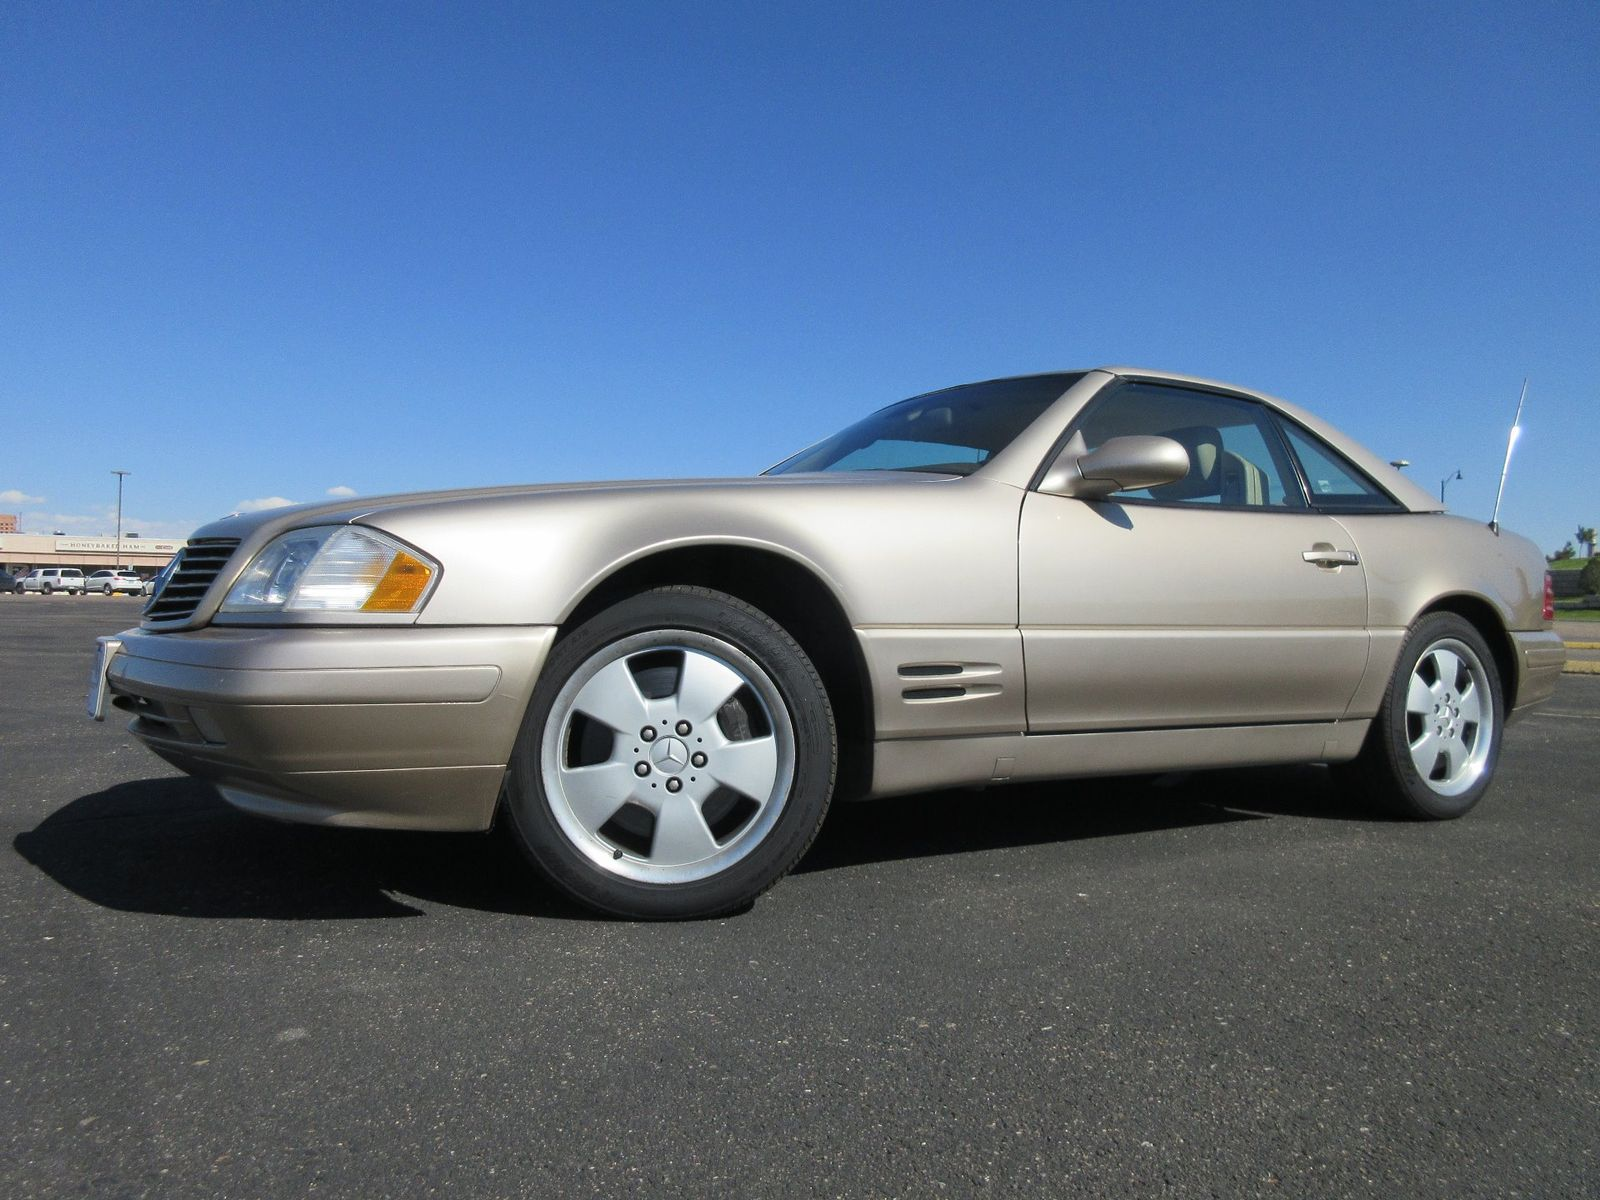 2000 Mercedesbenz Sl500 Fultons Used Cars Inc. 2000 Mercedesbenz Sl500 Fultons Used Cars Inc In Colorado. Mercedes Benz. Mercedes Benz 2000 Sl500 Wiring At Scoala.co